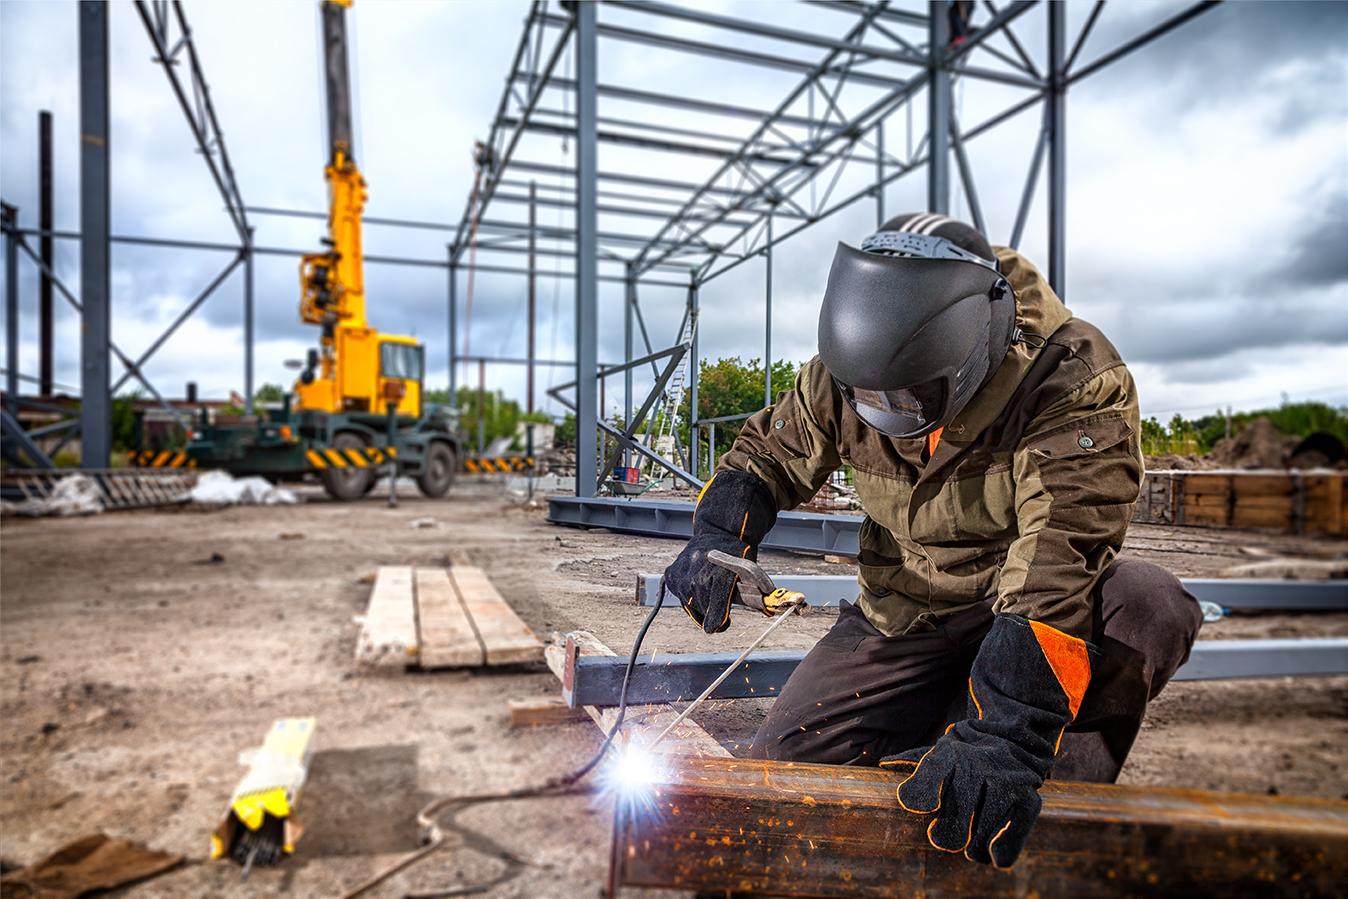 A young  man welder in brown uniform, welding mask and welders l